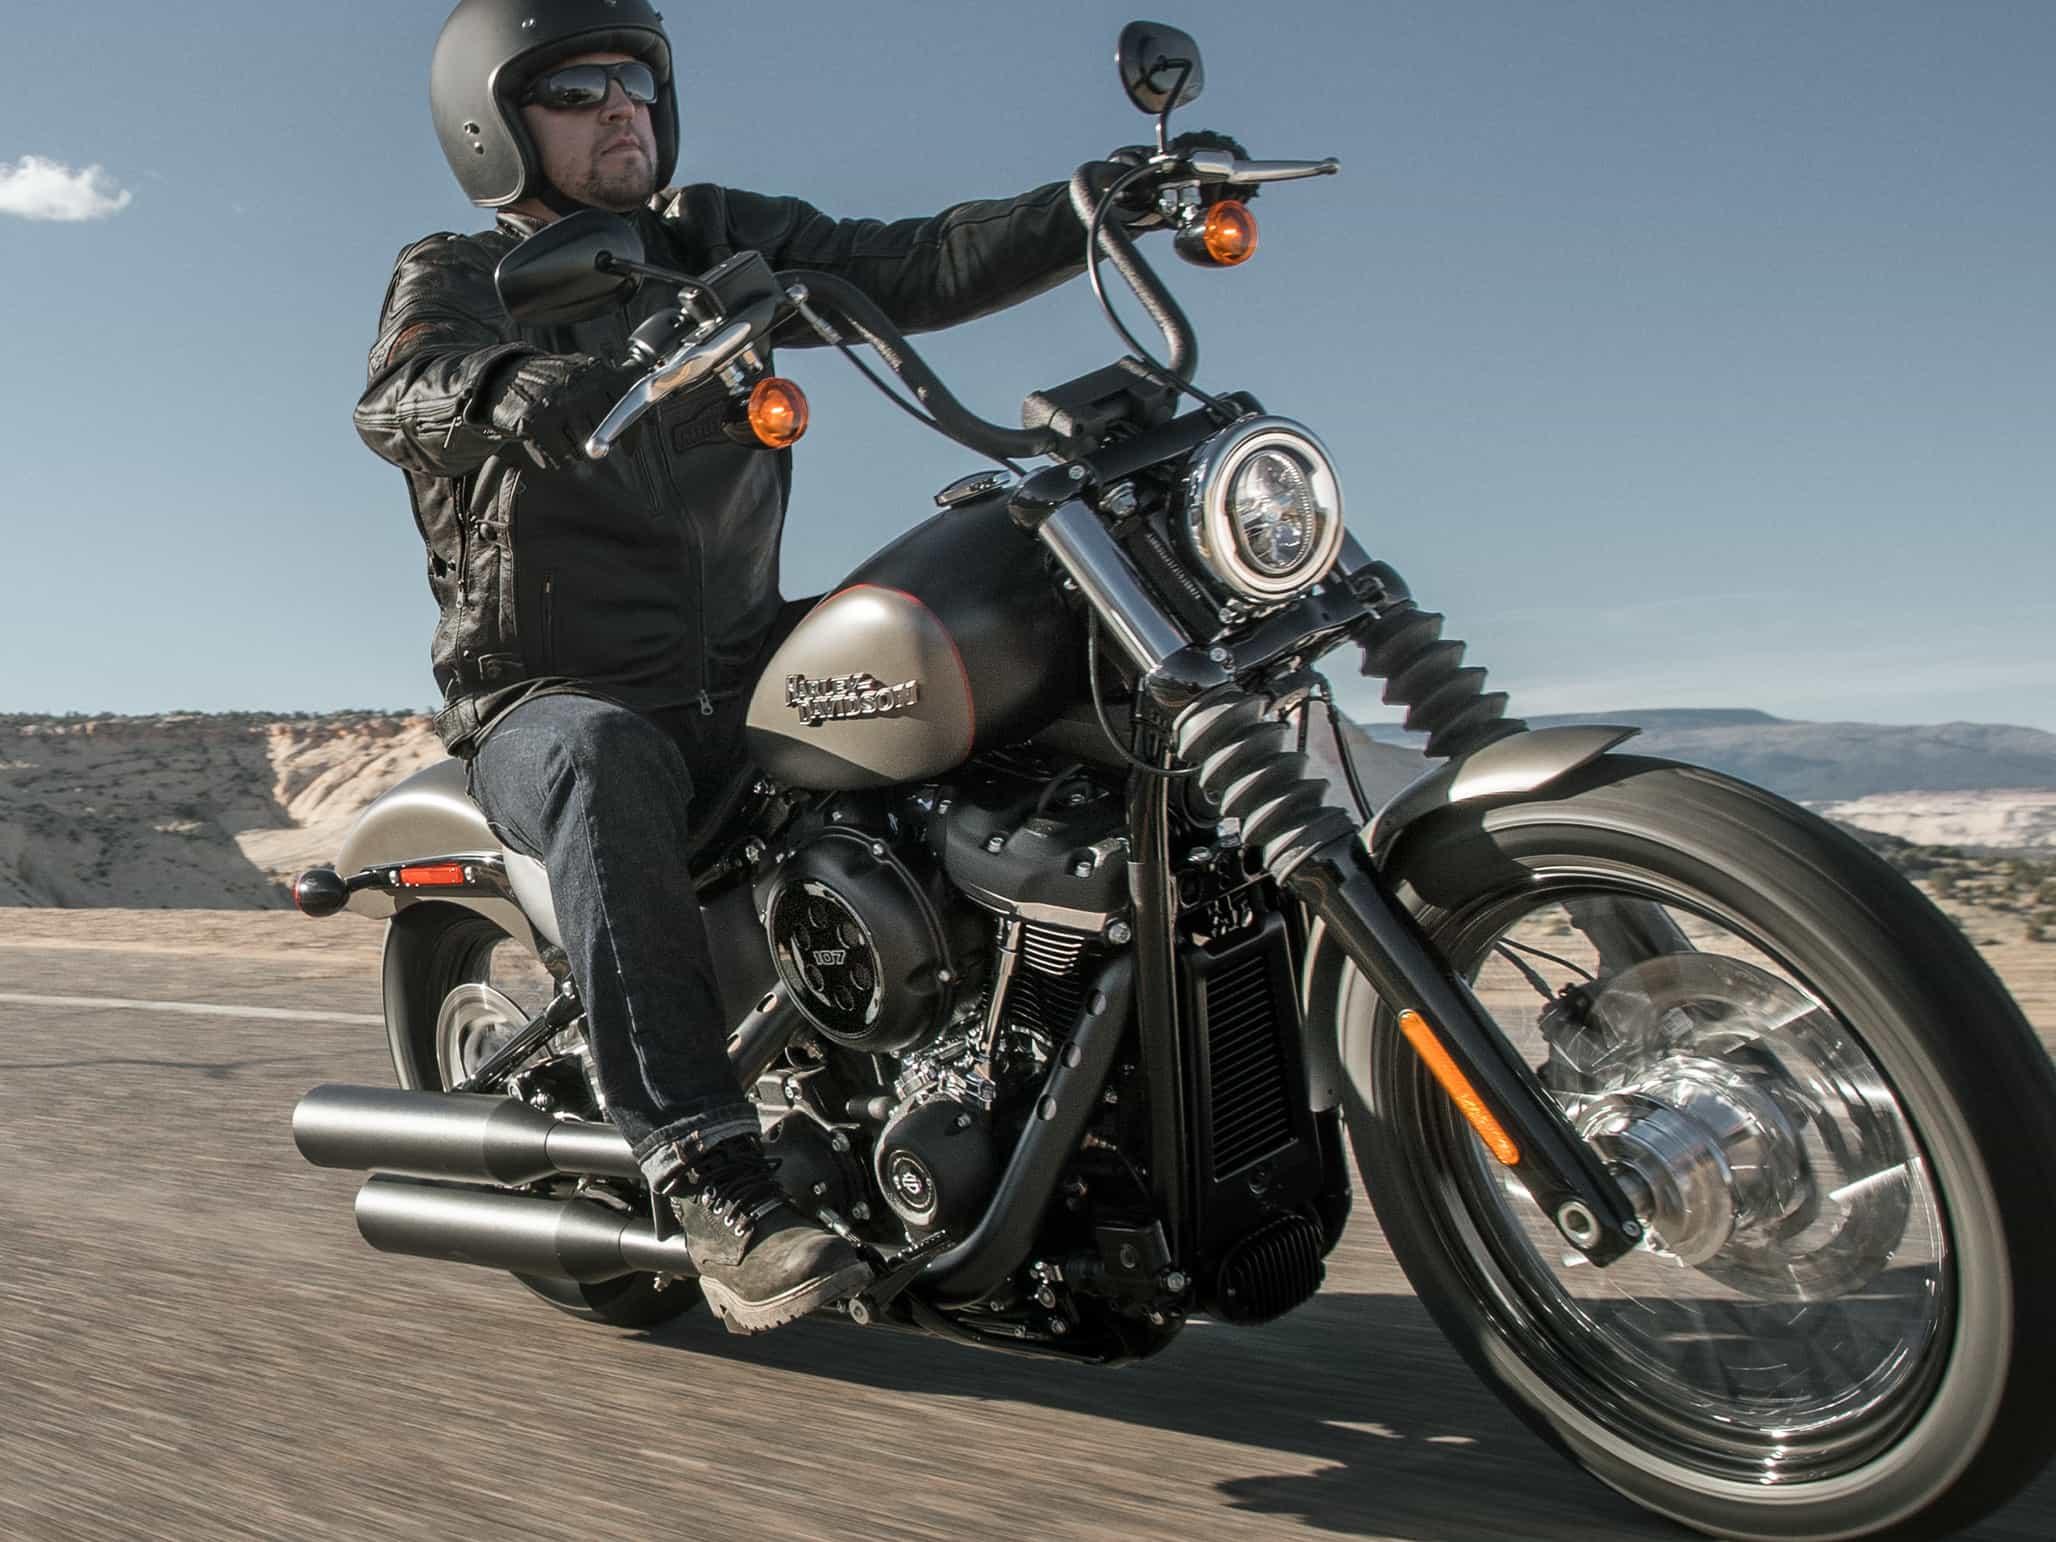 2000 Harley Davidson fxd dyna service manual street bob low rider super  glide